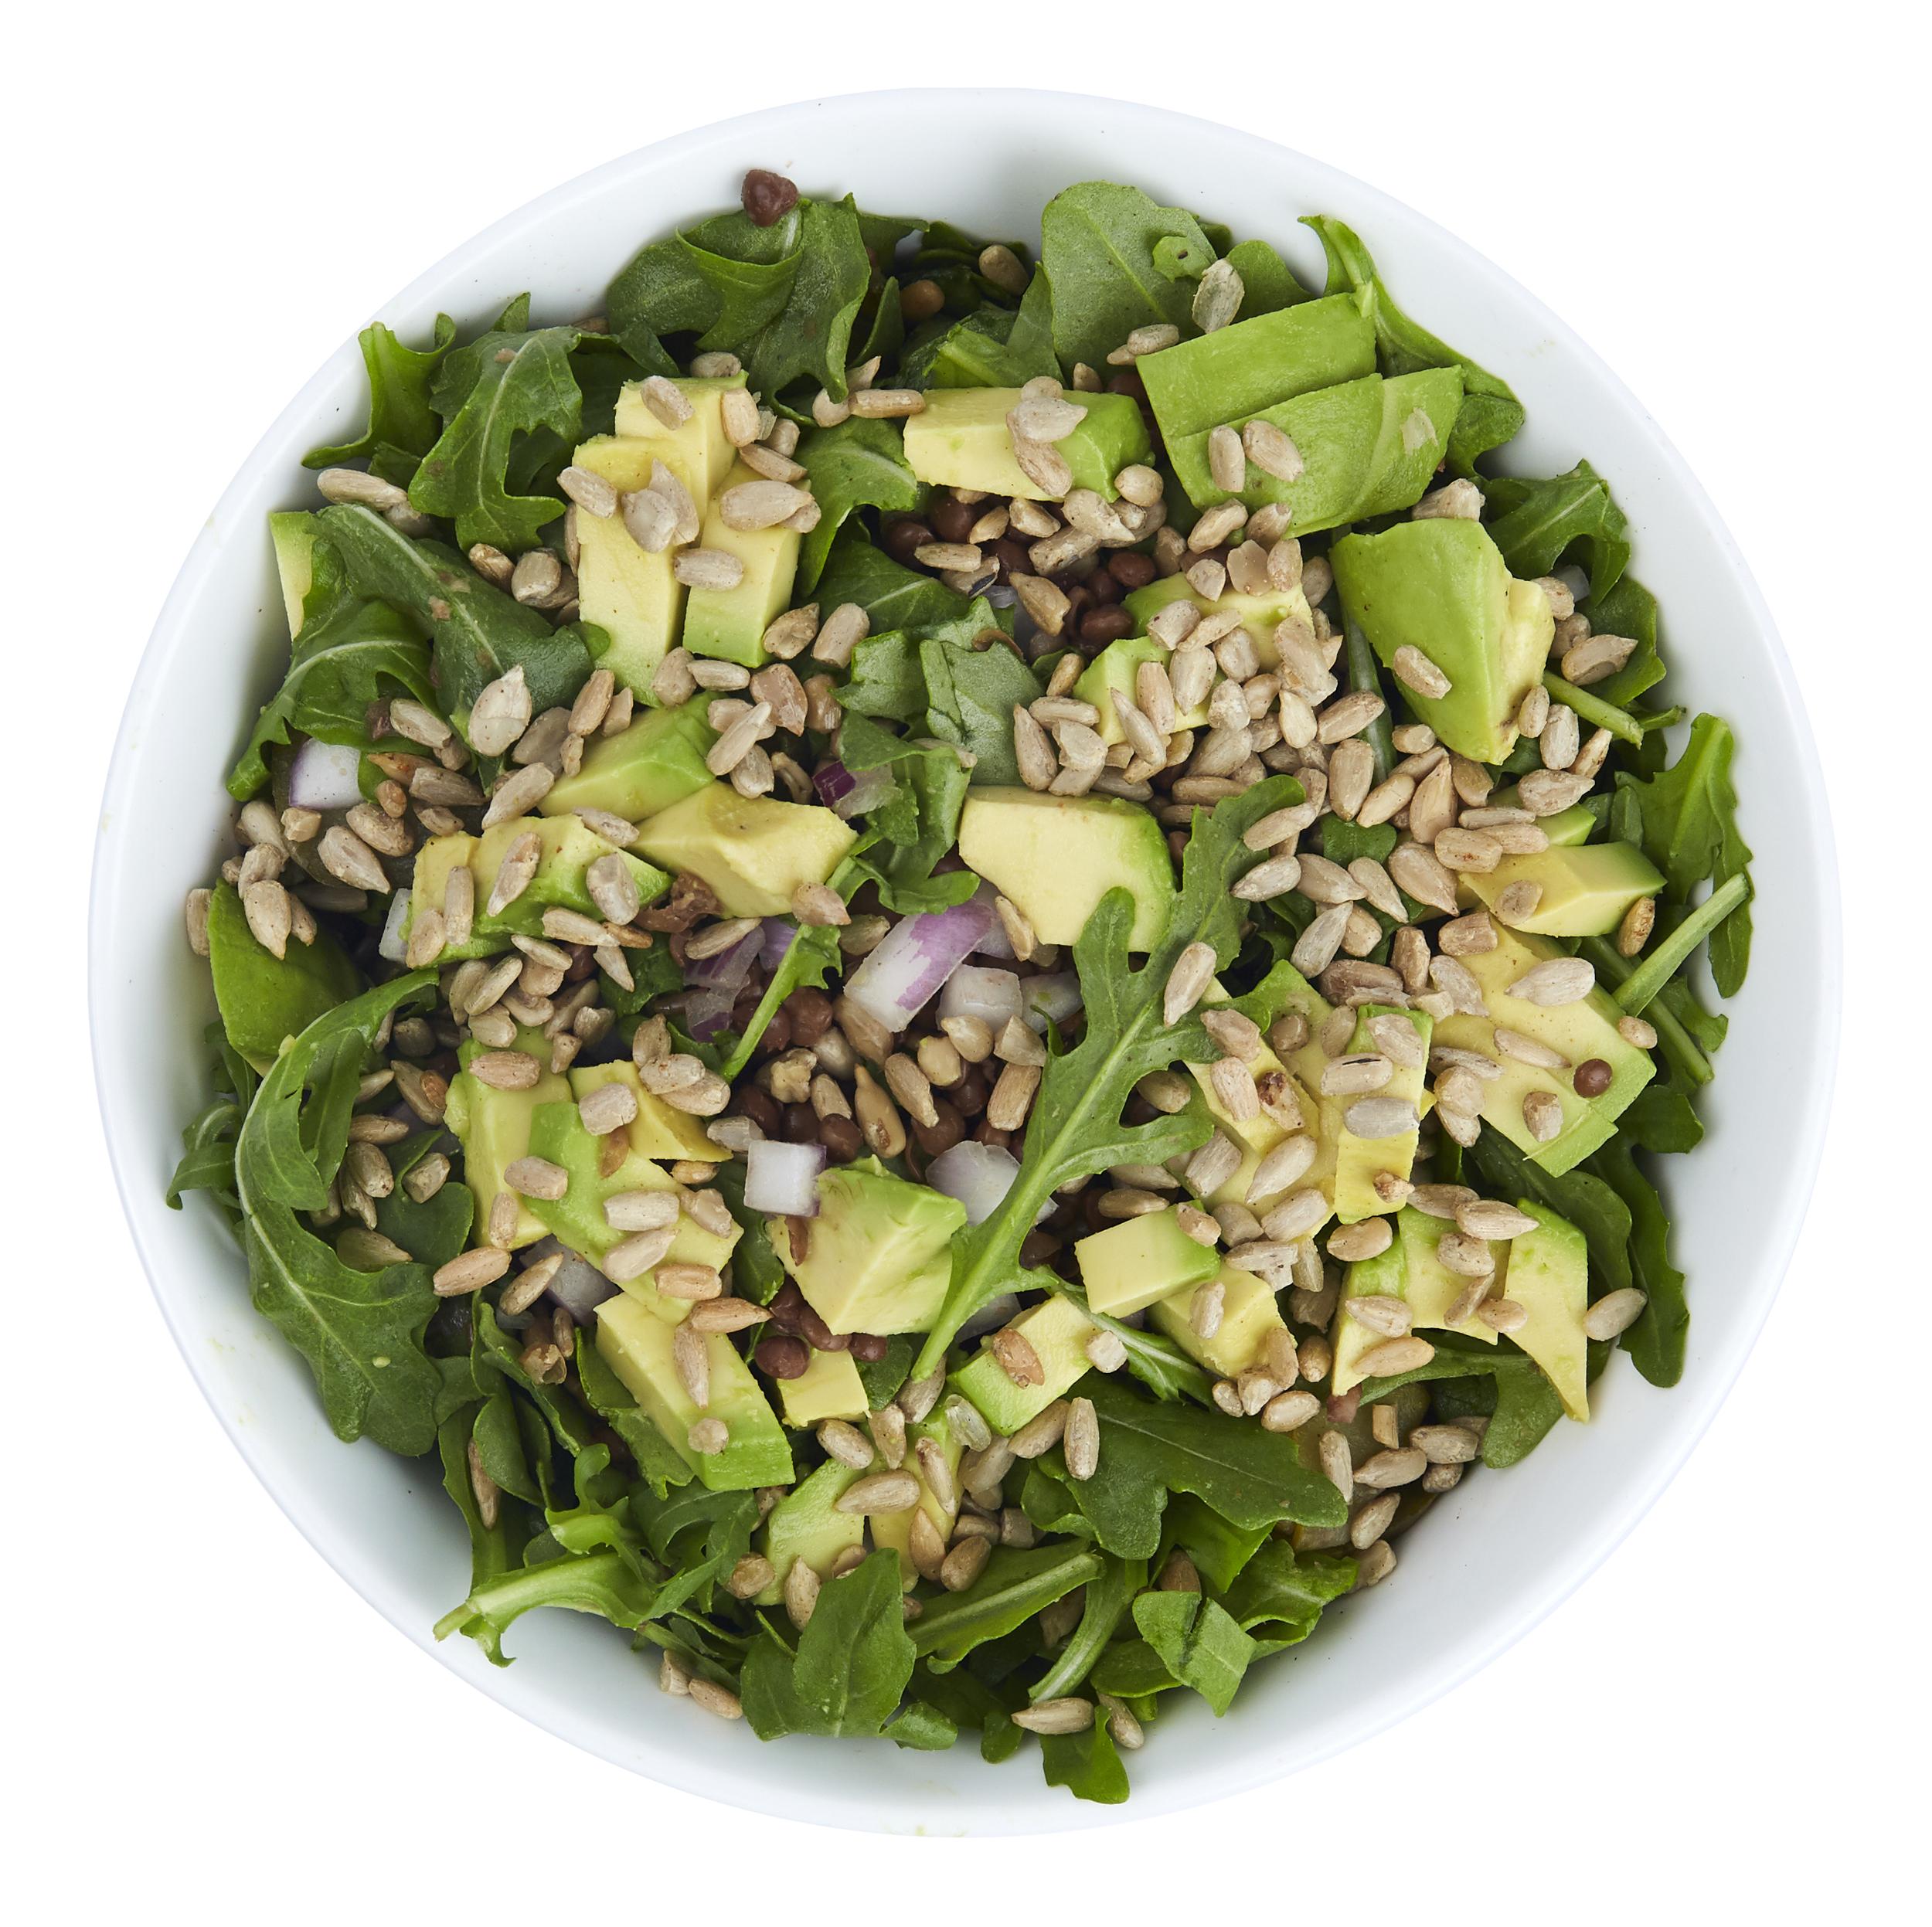 Power Lentil Salad - $10.99  Lentils, arugula, pickles, avocado, spicy sunflower seeds, onions, honey-mustard dressing